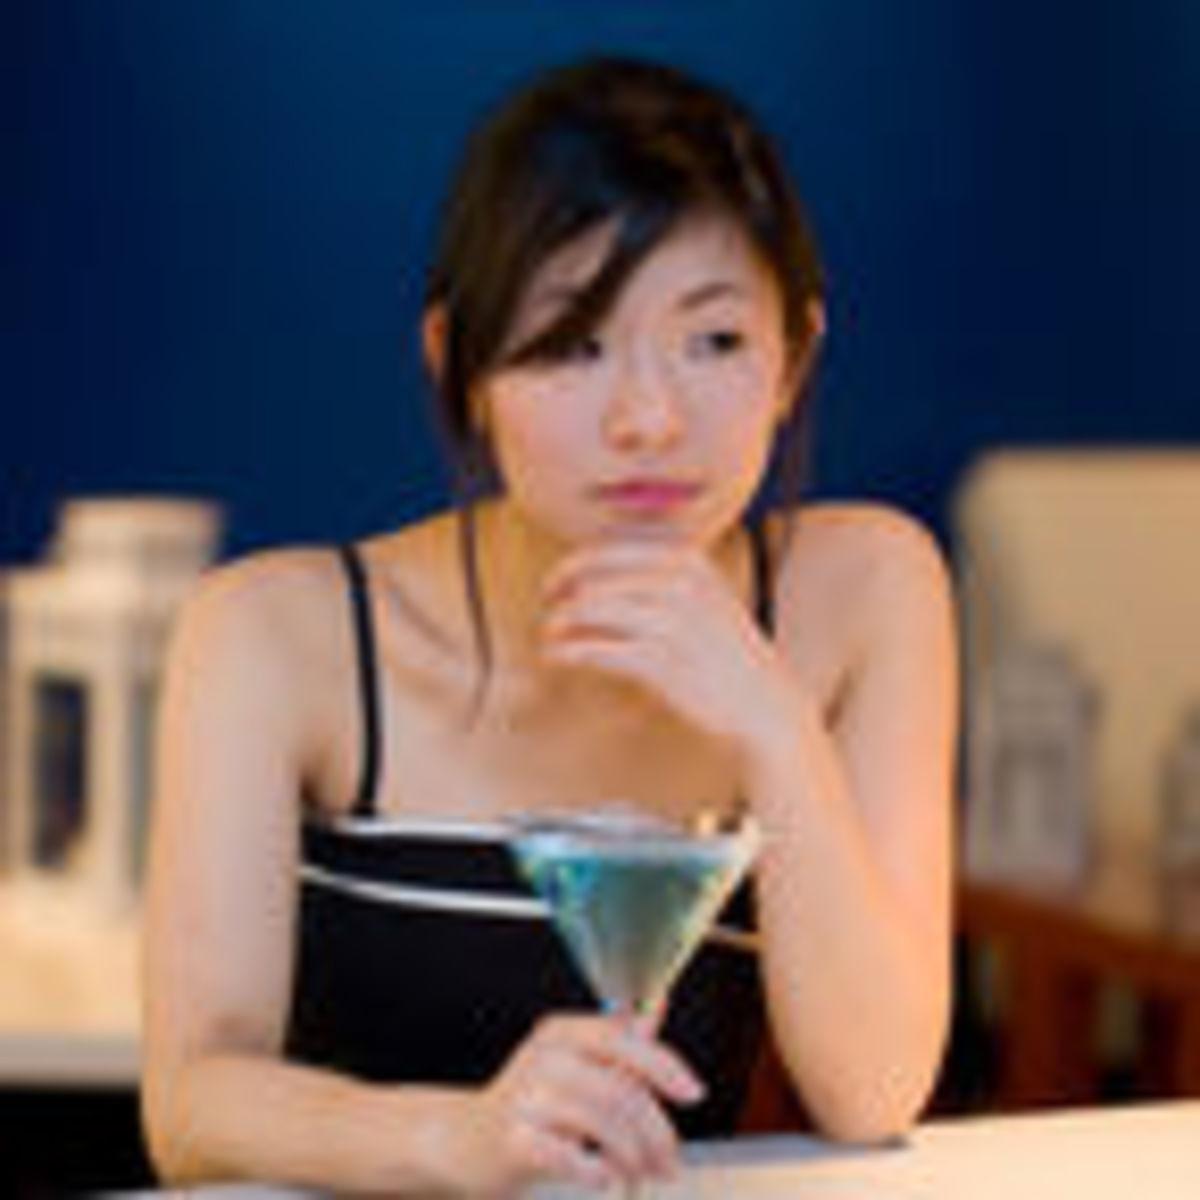 Women dating site ugly cdn.powder.com